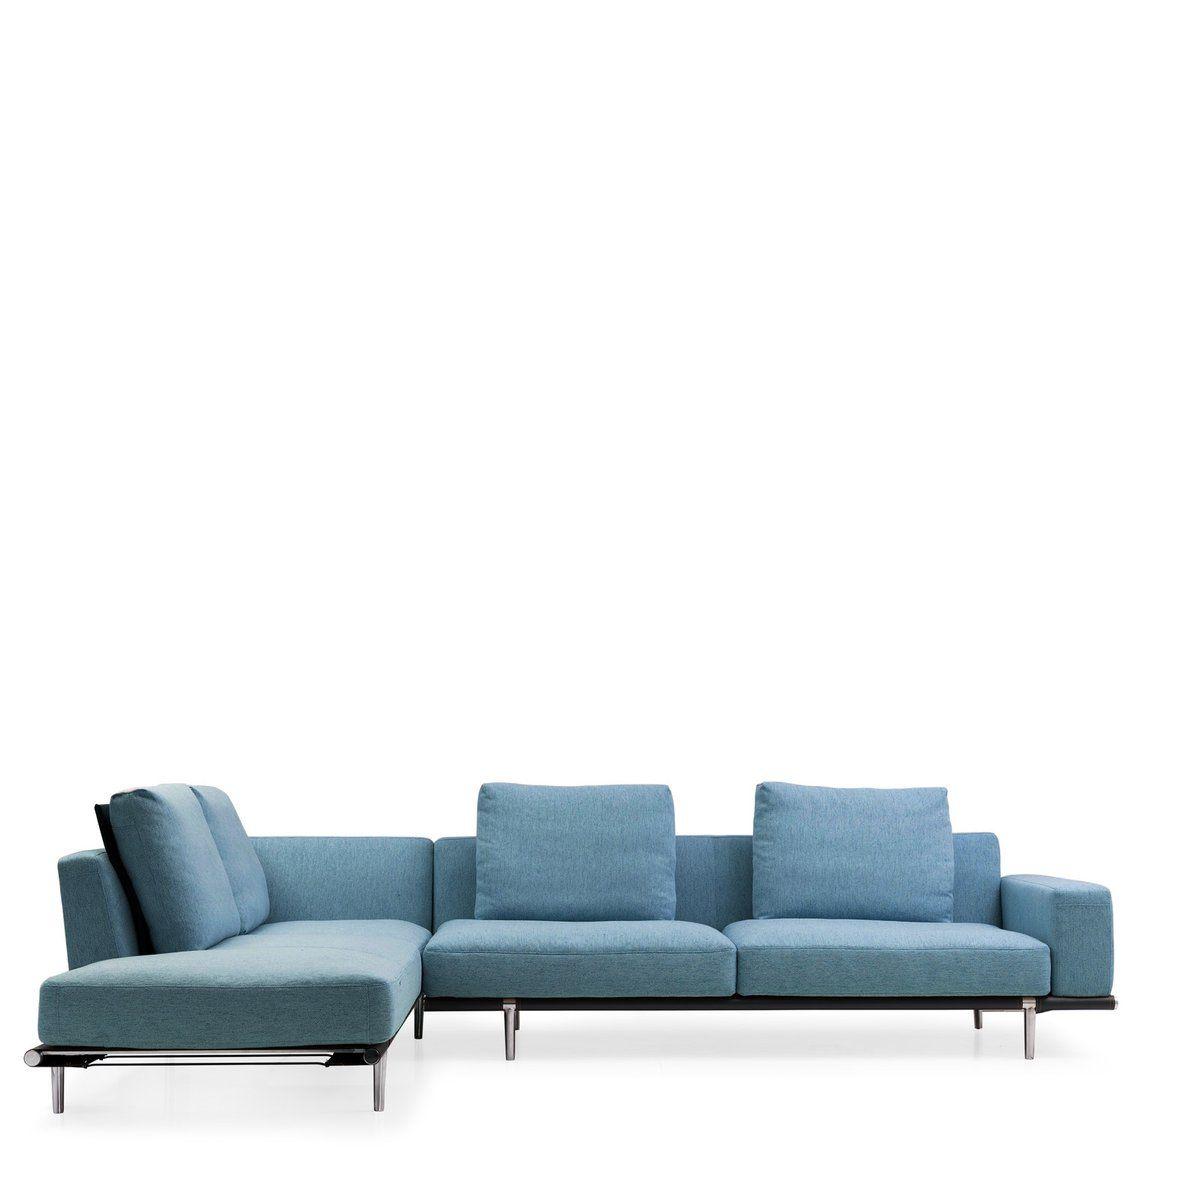 Chur L Shape Sofa Sf038 Light Blue In 2020 L Shaped Sofa Corner Sofa Set Sofa Set